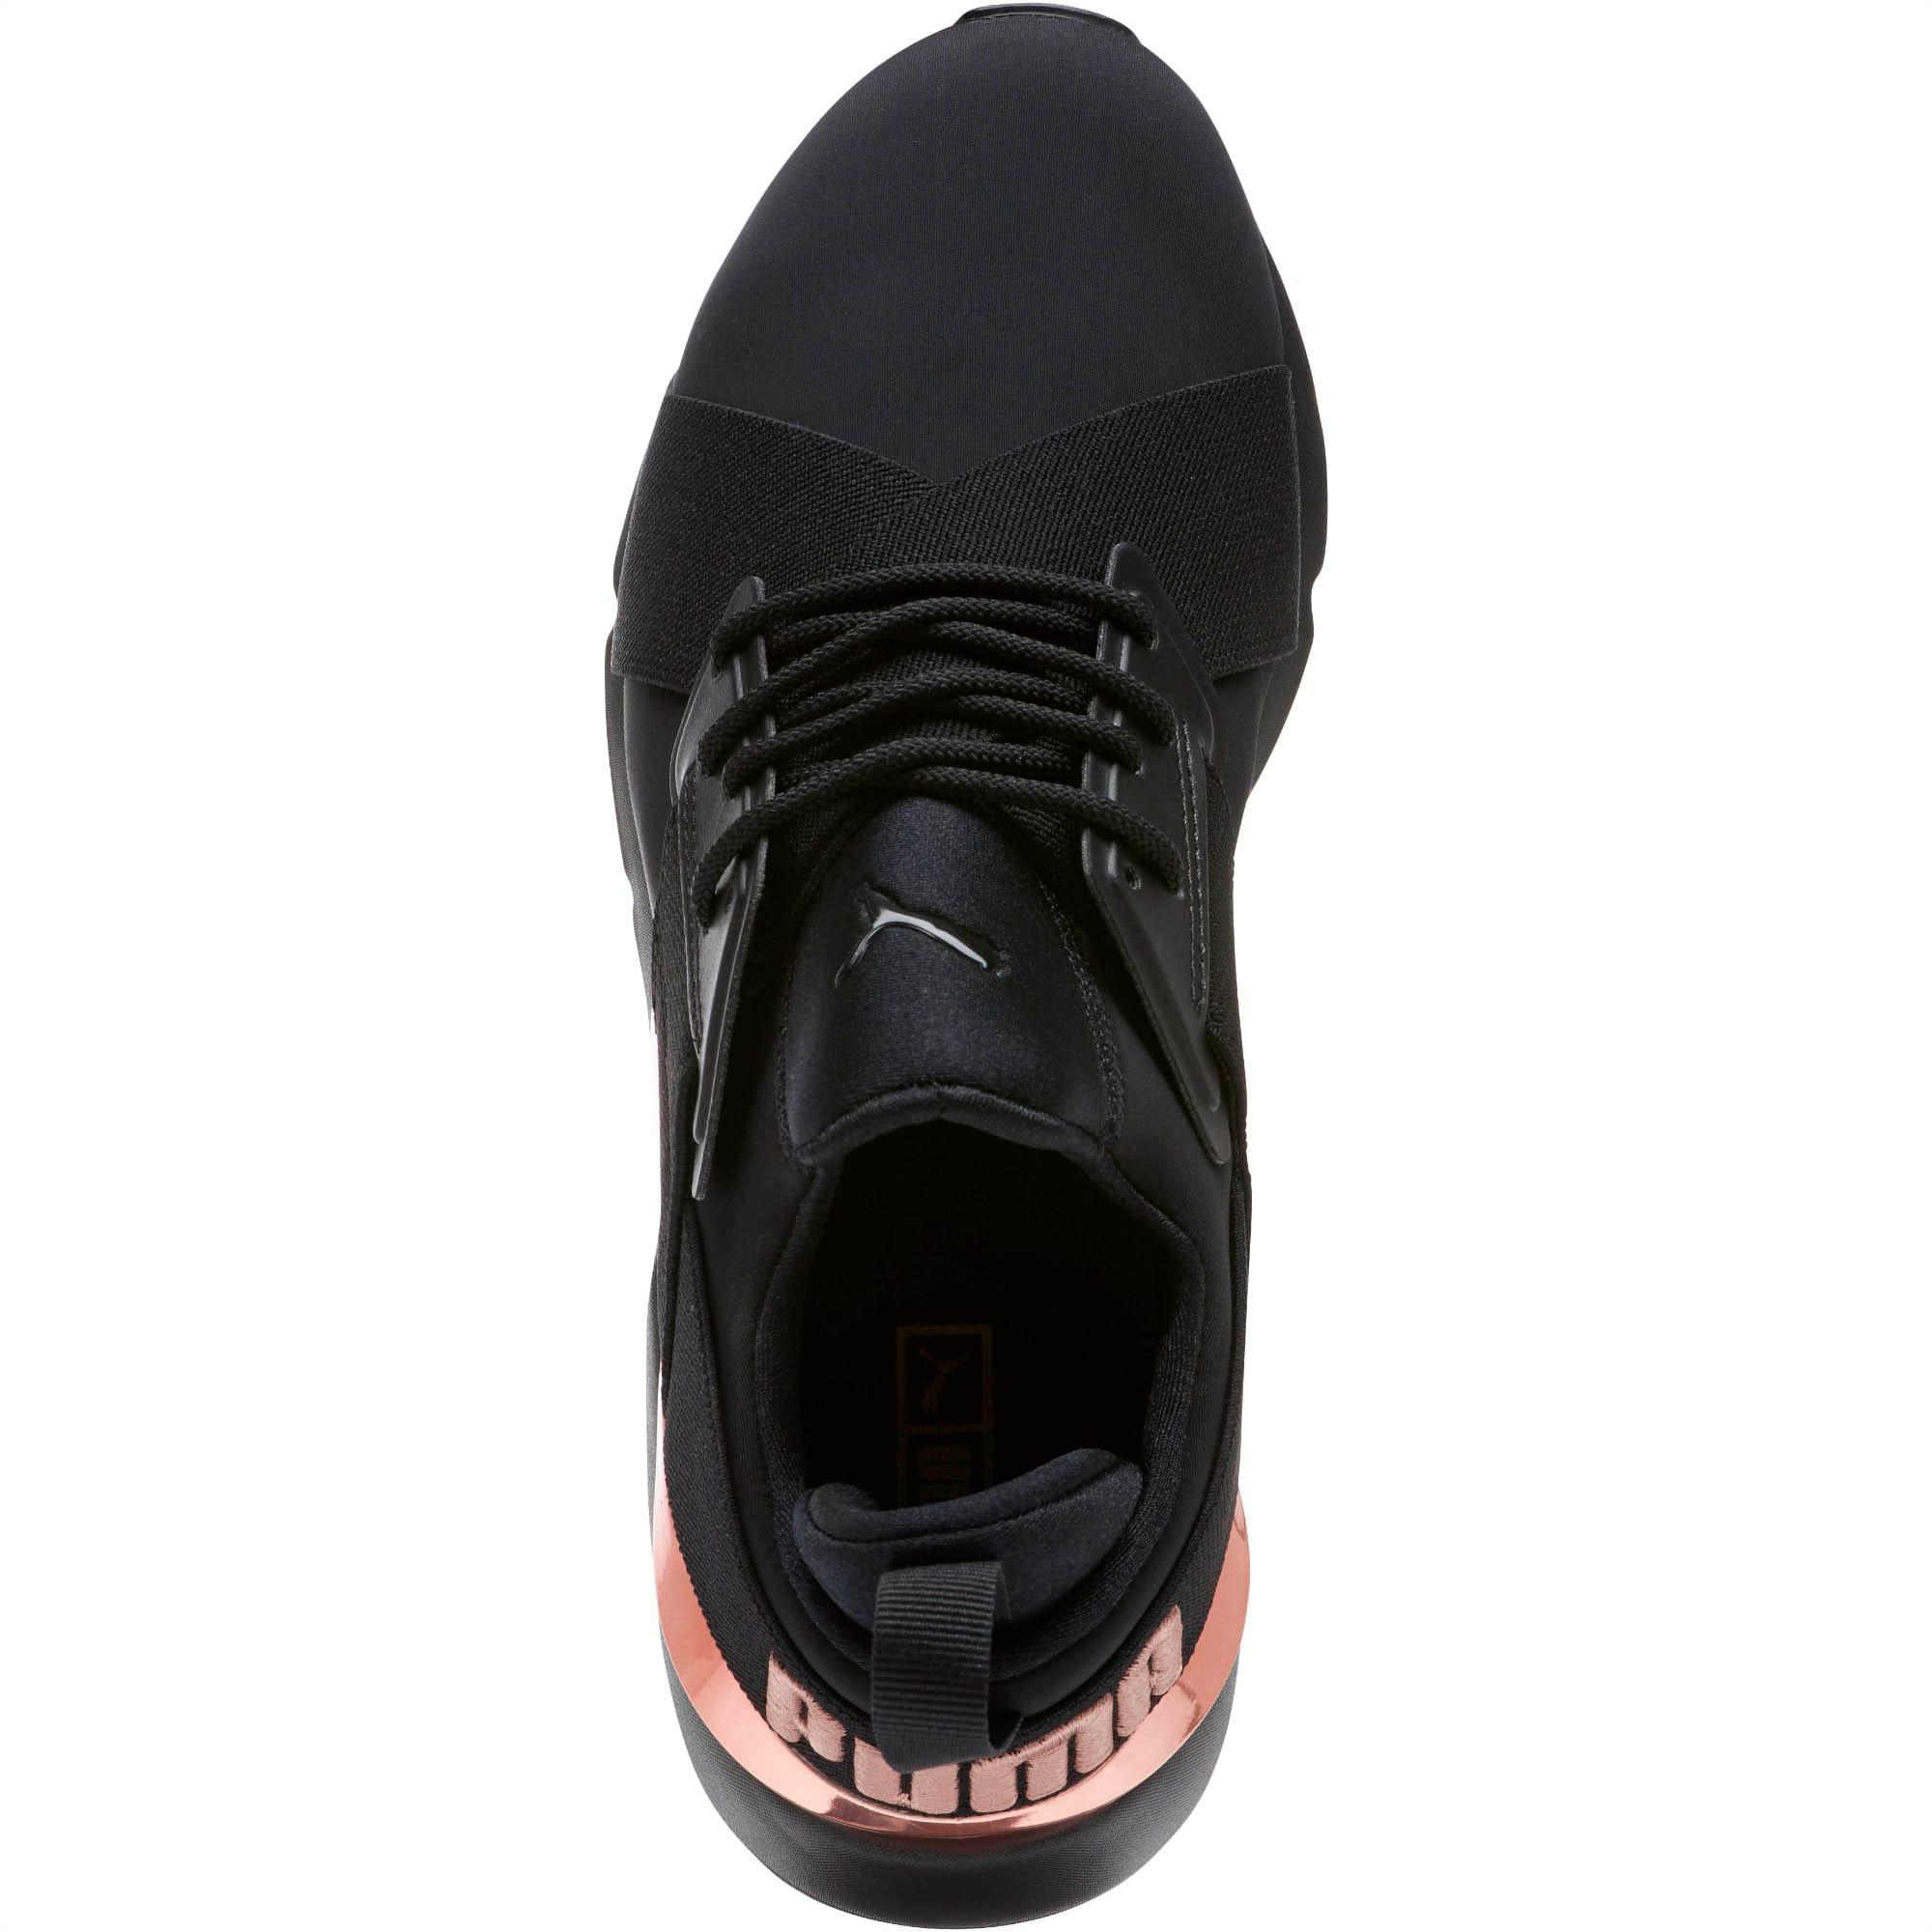 Muse Metal Women's Sneakers